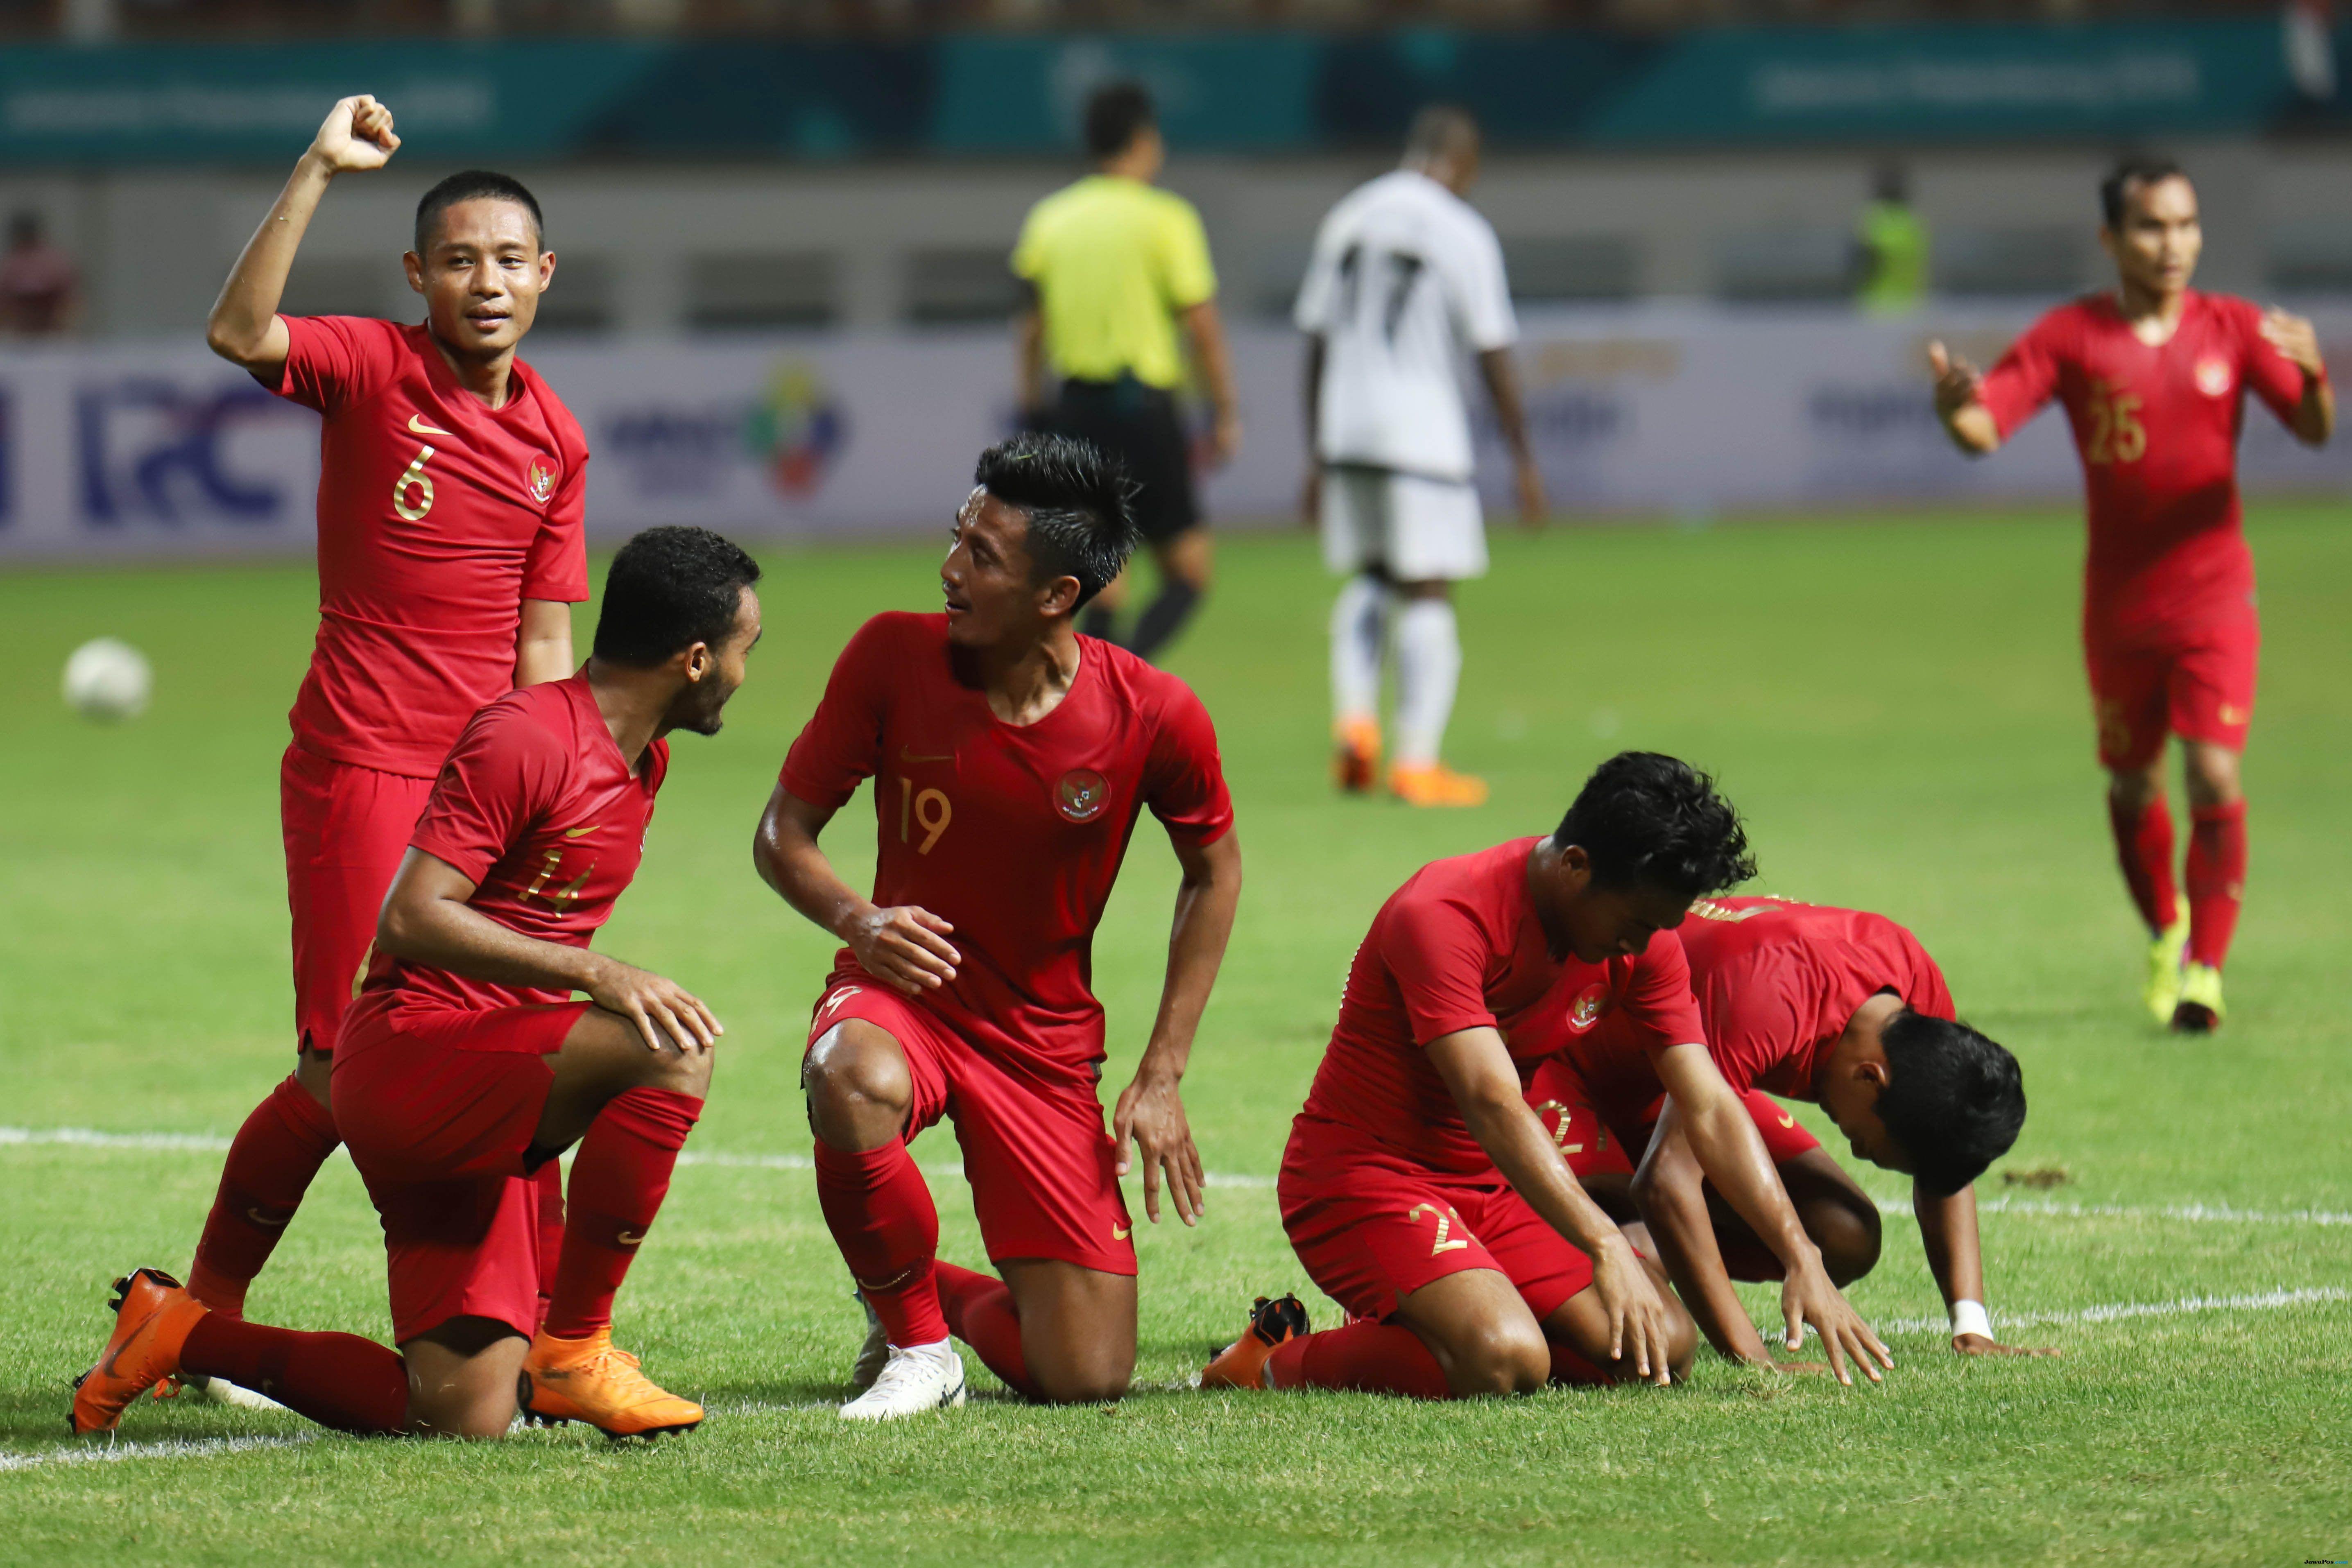 Mantan Penggawa Timnas Prancis Terkesima Suporter Indonesia